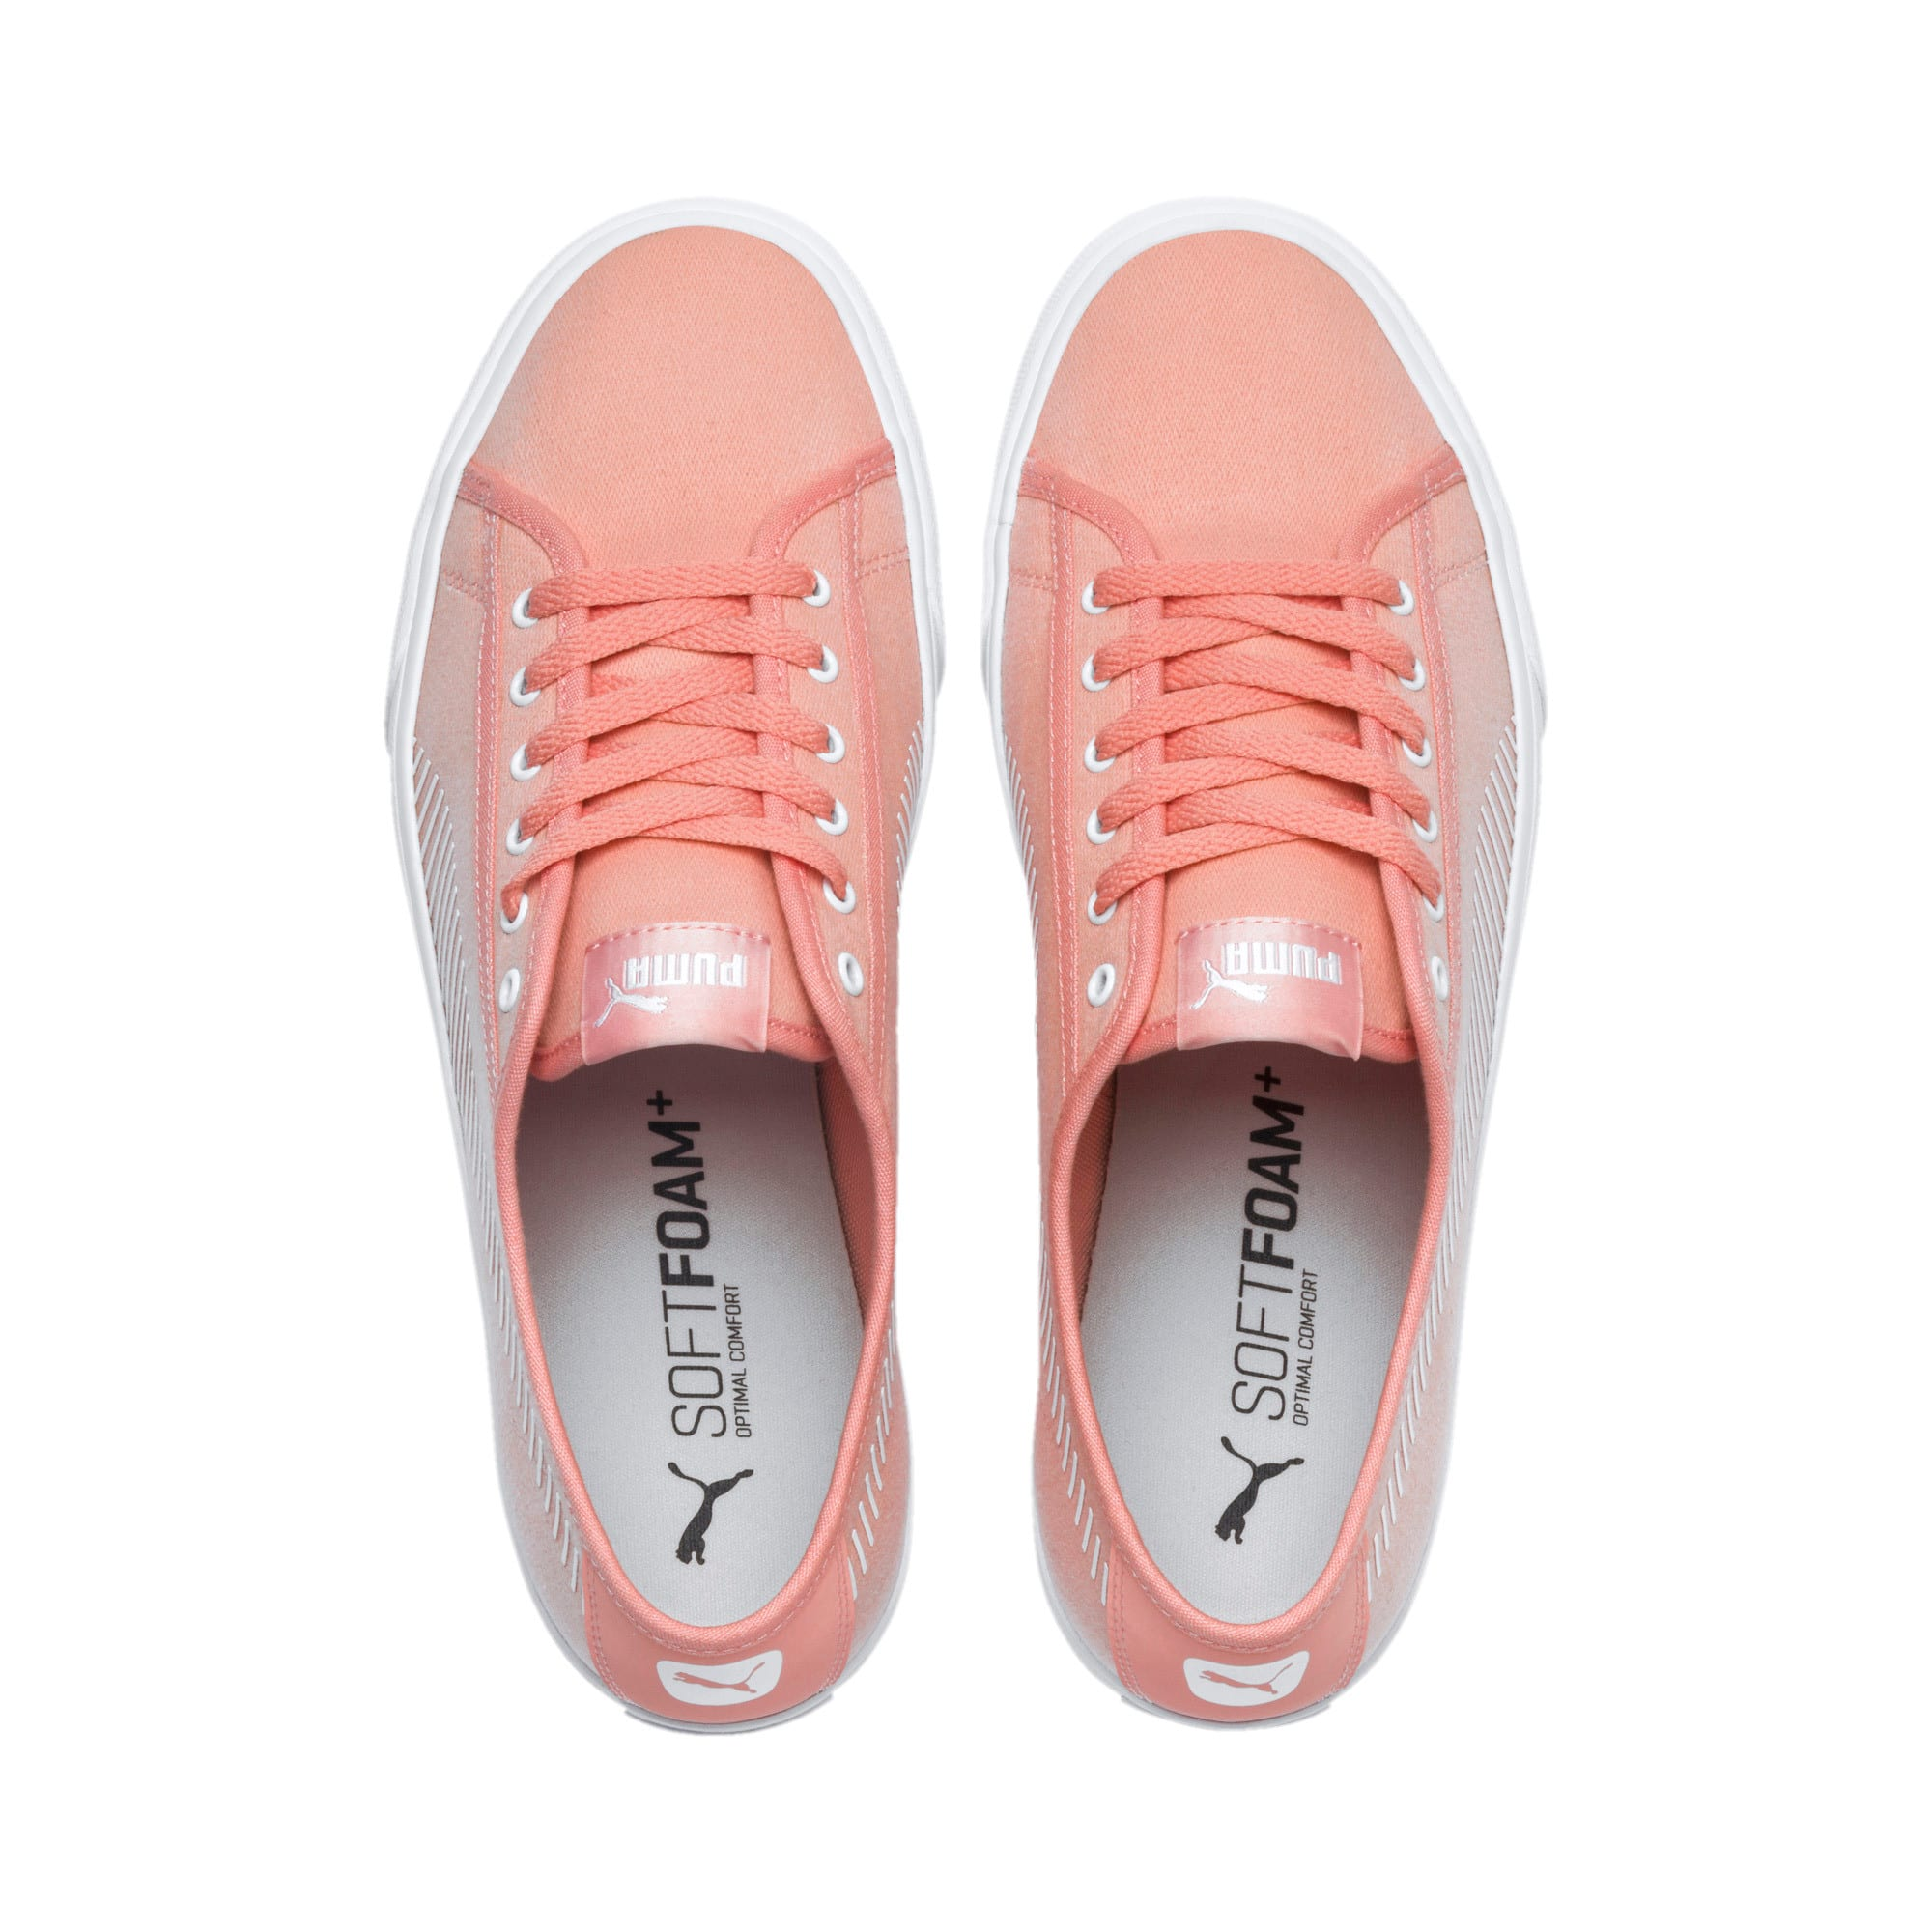 Thumbnail 6 of Bari Sneakers, Peach Bud-Puma White, medium